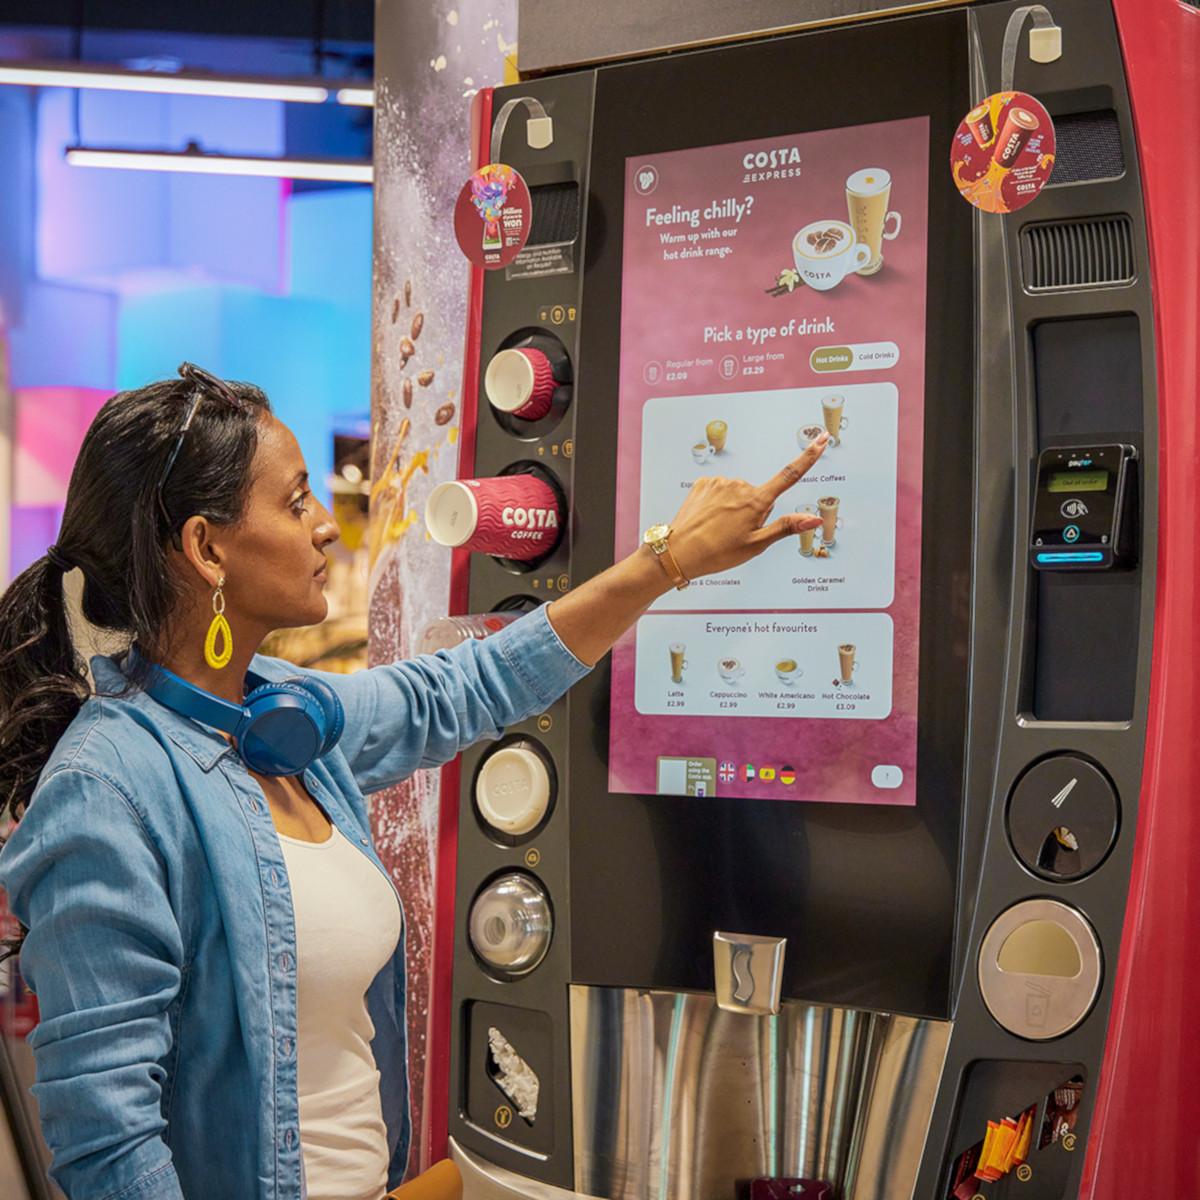 Costa Coffee Automaten mit großem Touchscreen (Foto: Coca-Cola)